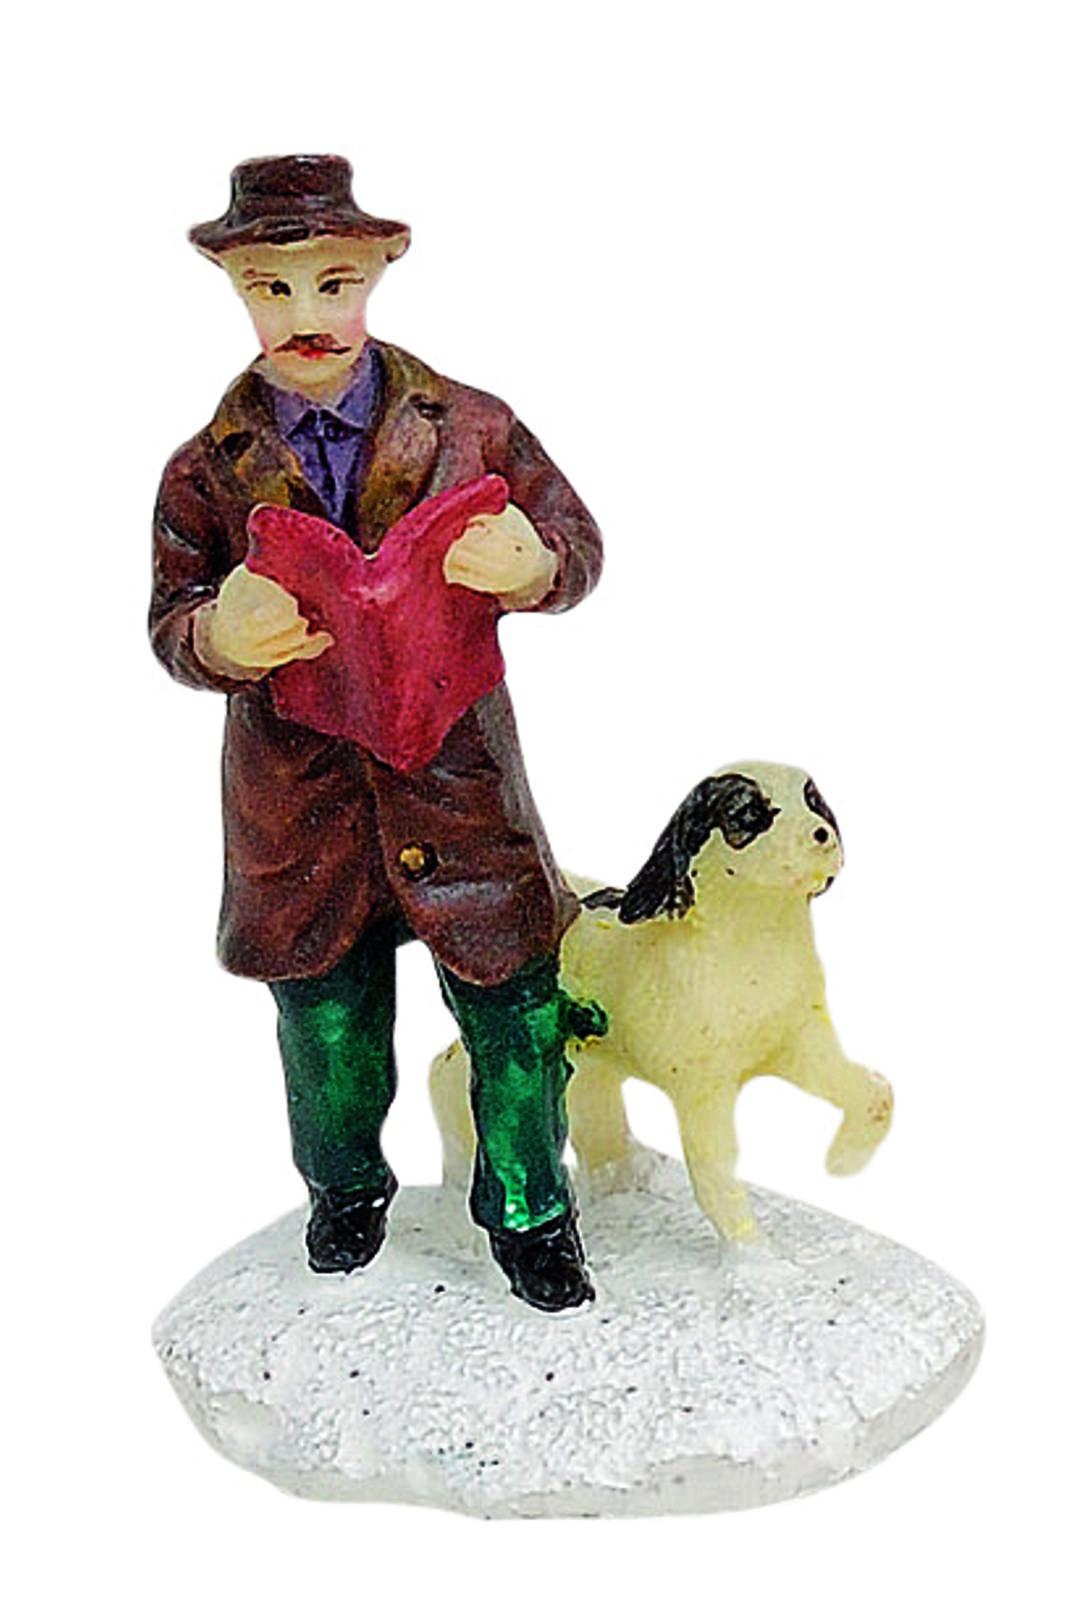 Lichthaus Wurm Accessories Christmas Miniature Winter Scene